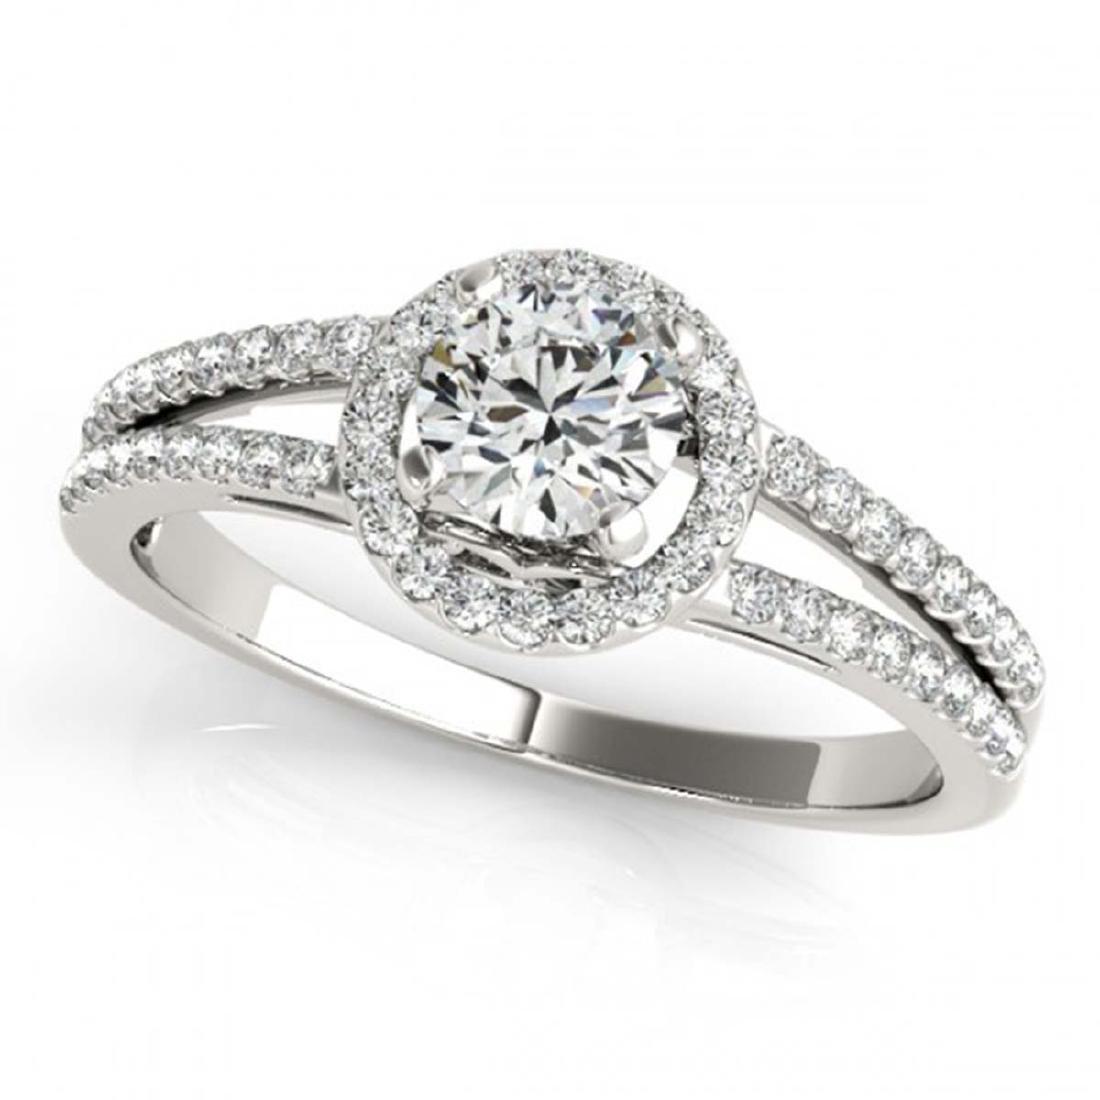 0.75 CTW VS/SI Diamond Solitaire Halo Ring 14K White